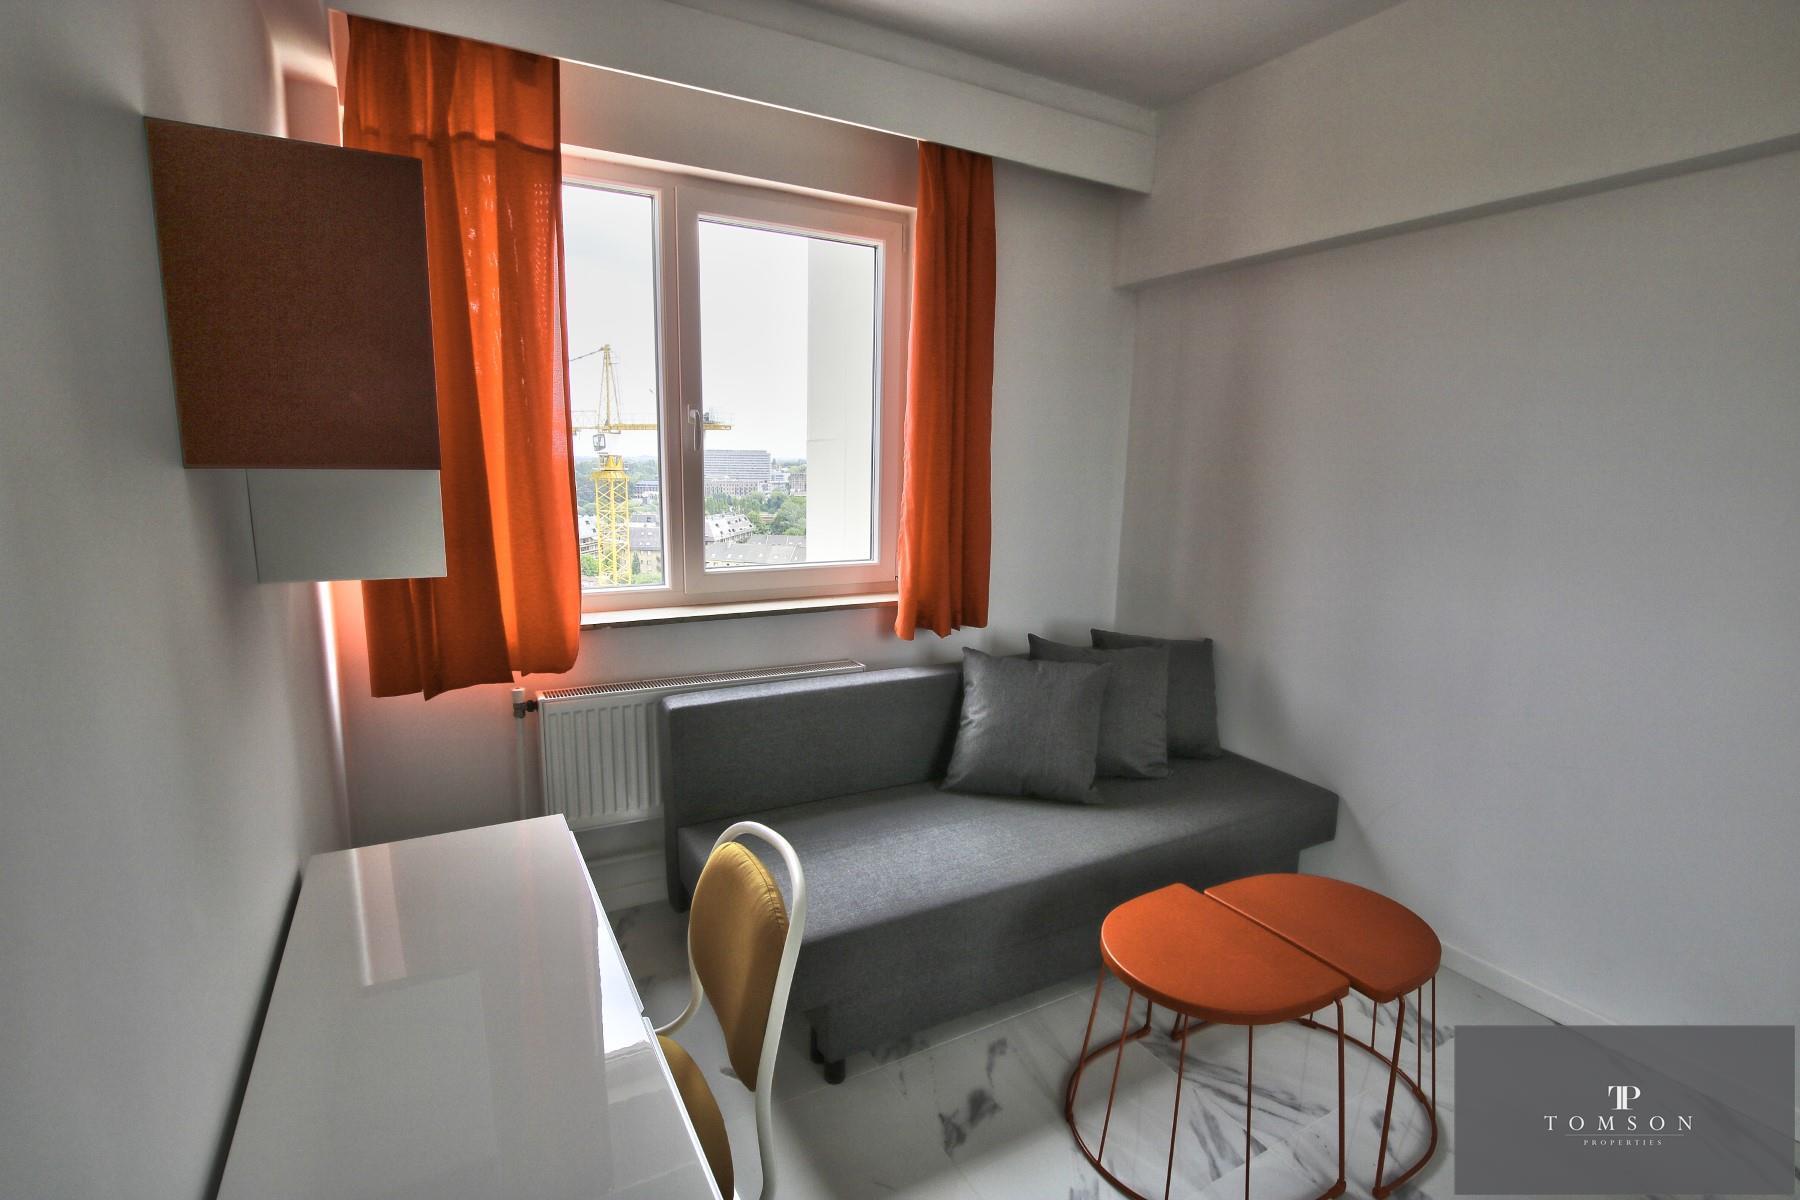 Appartement - Woluwe-Saint-Lambert - #4530512-6